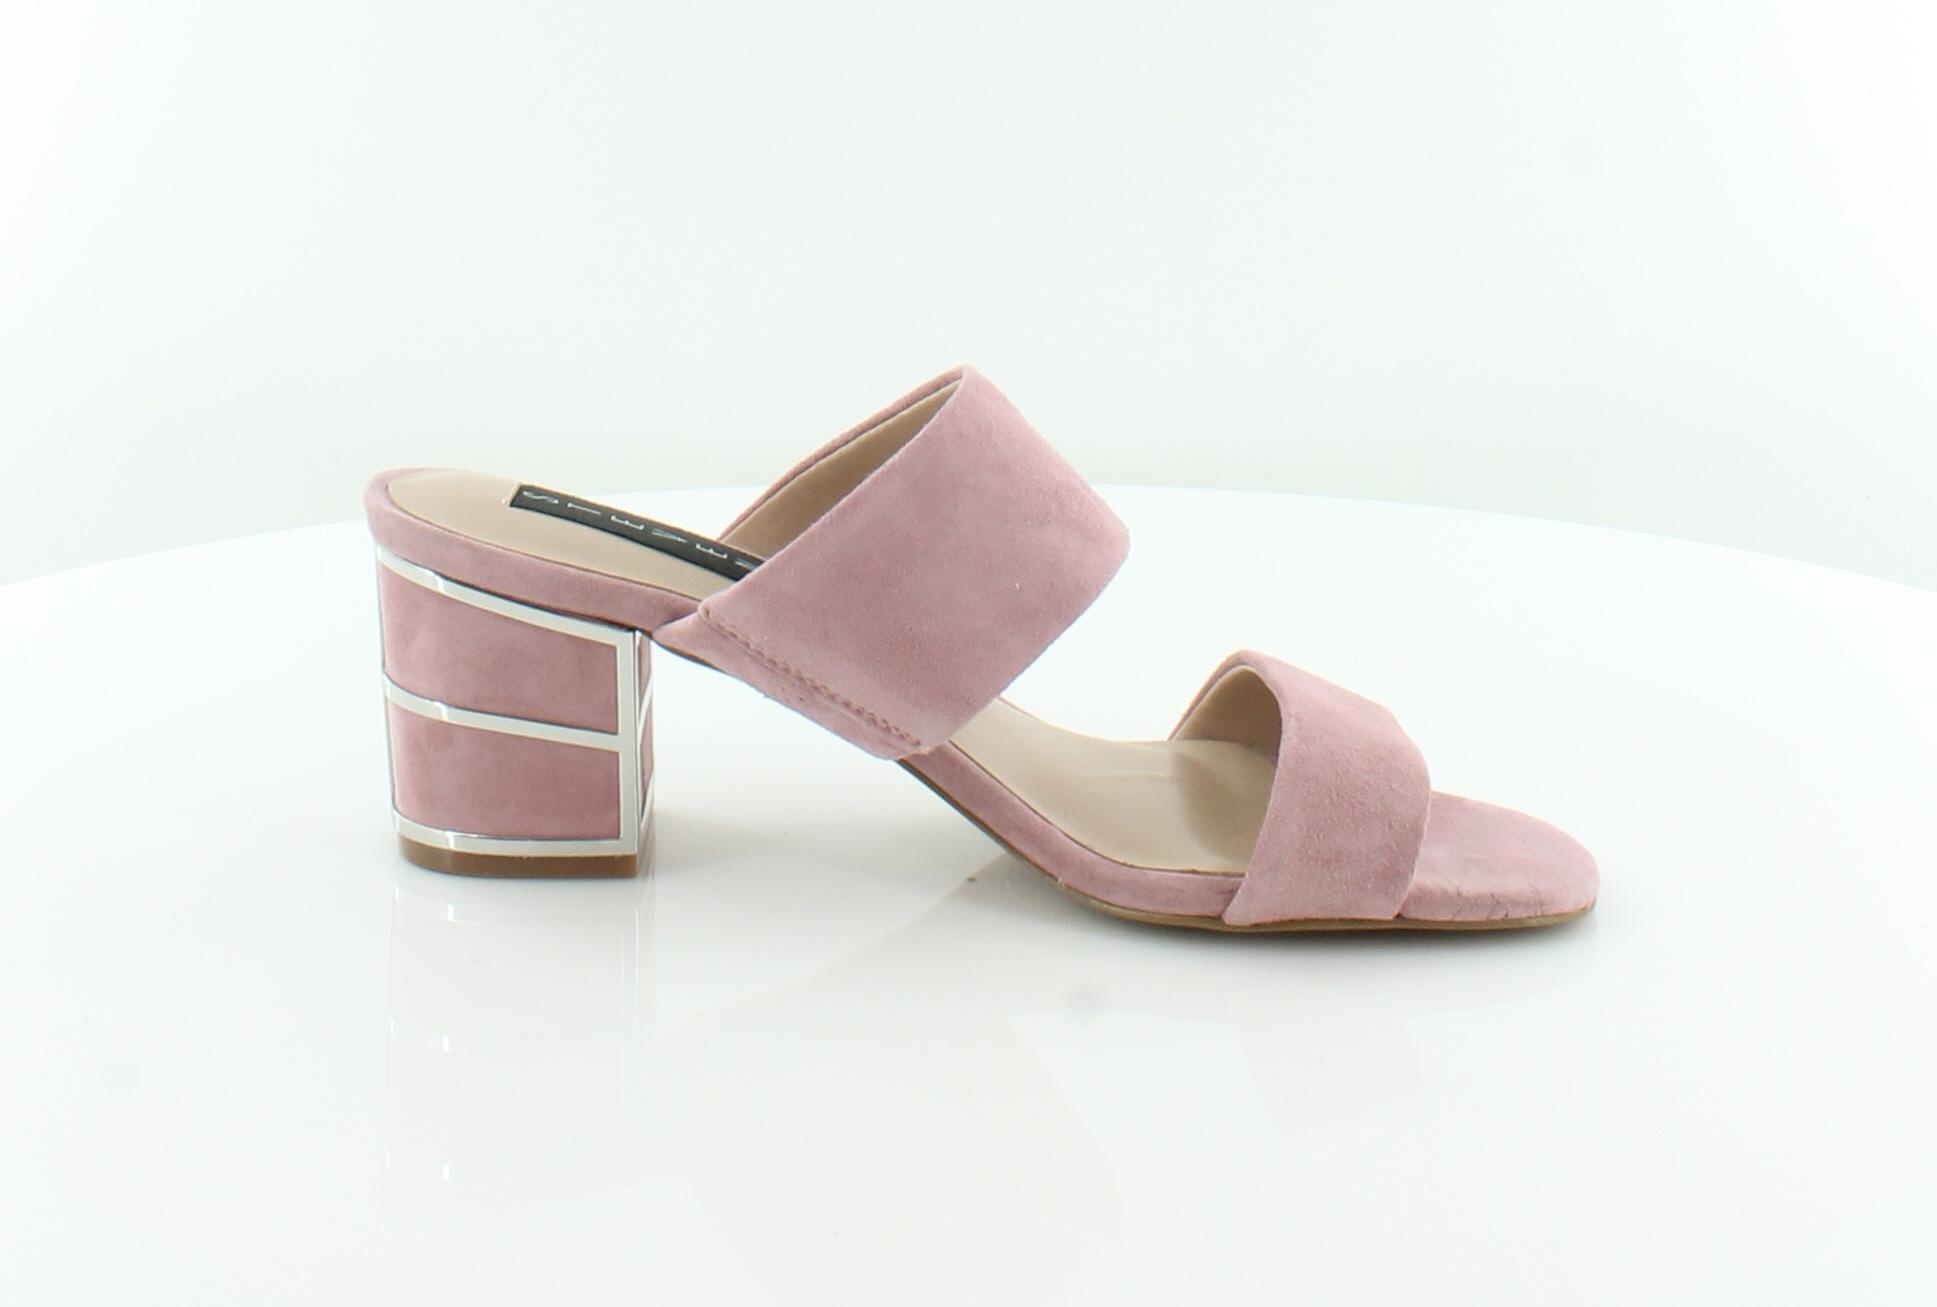 161e2c41d61 STEVEN BY STEVE Madden Siggy Pink Womens Shoes Size 7.5 M Sandals MSRP $109